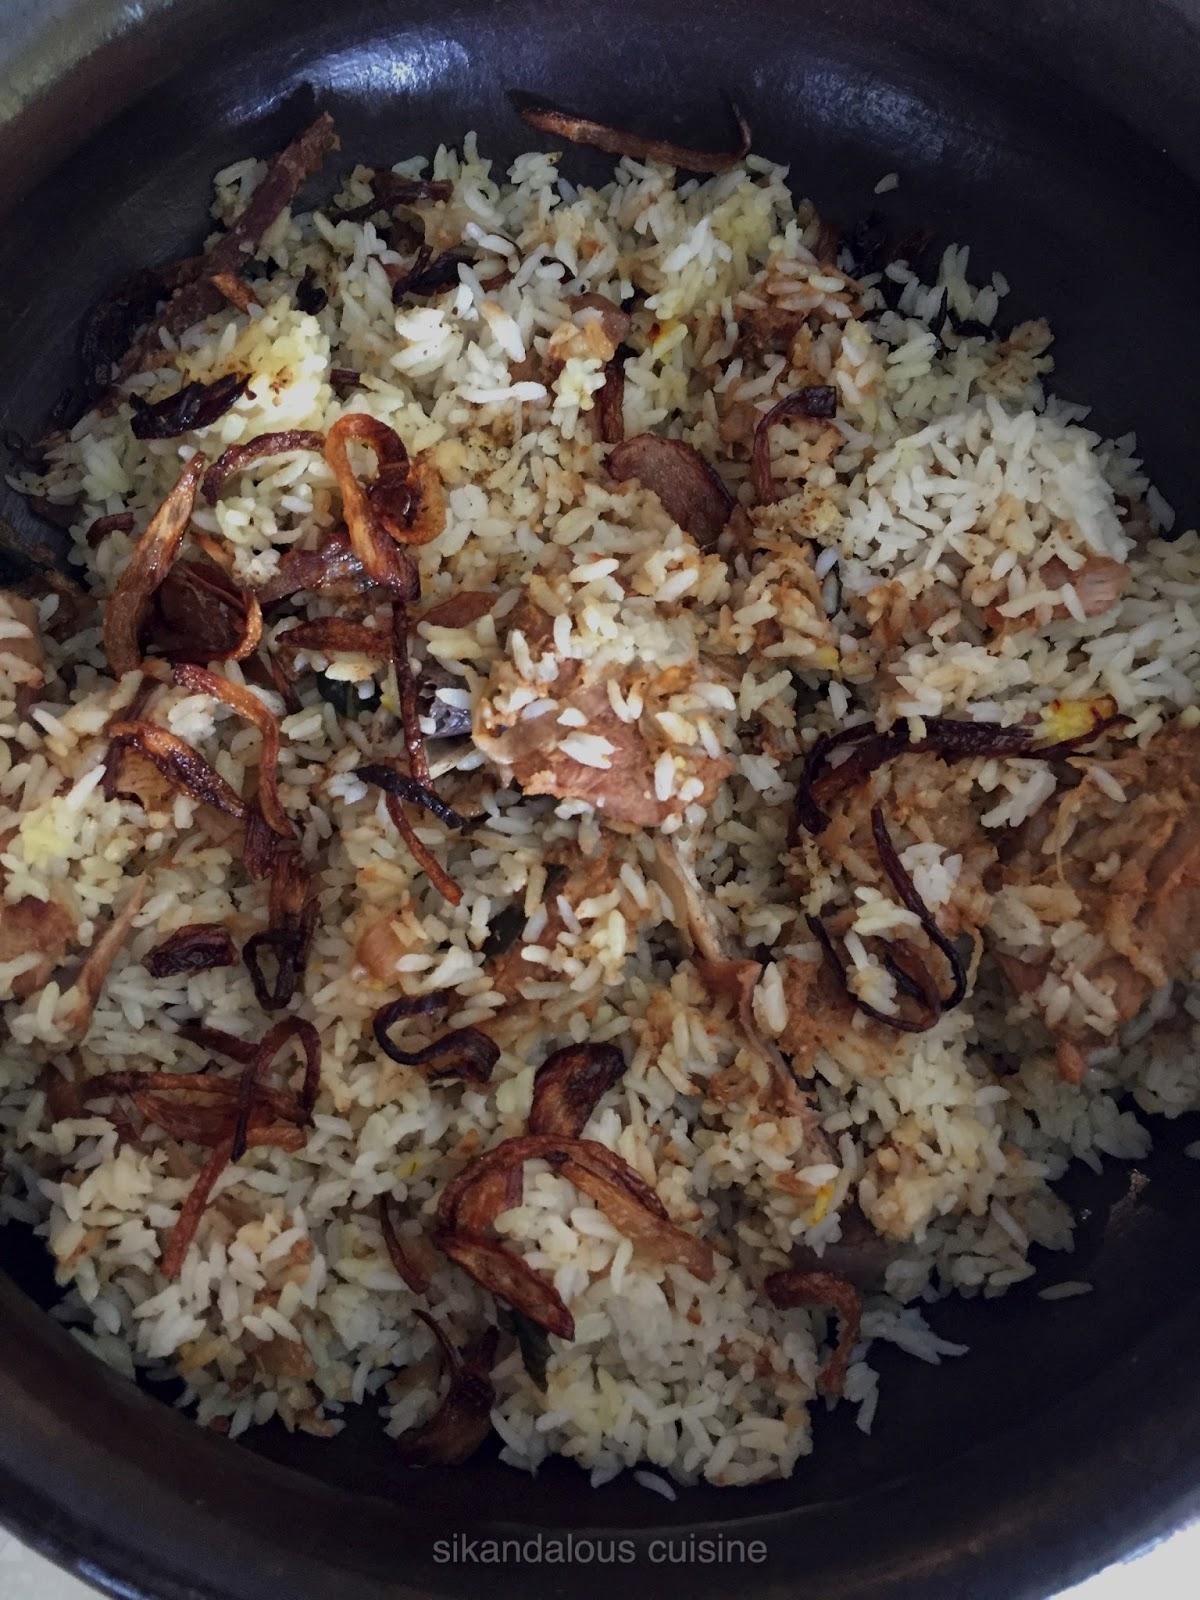 Sikandalous cuisine kerala mutton biryani sikandalouscuisine for Cuisine kerala